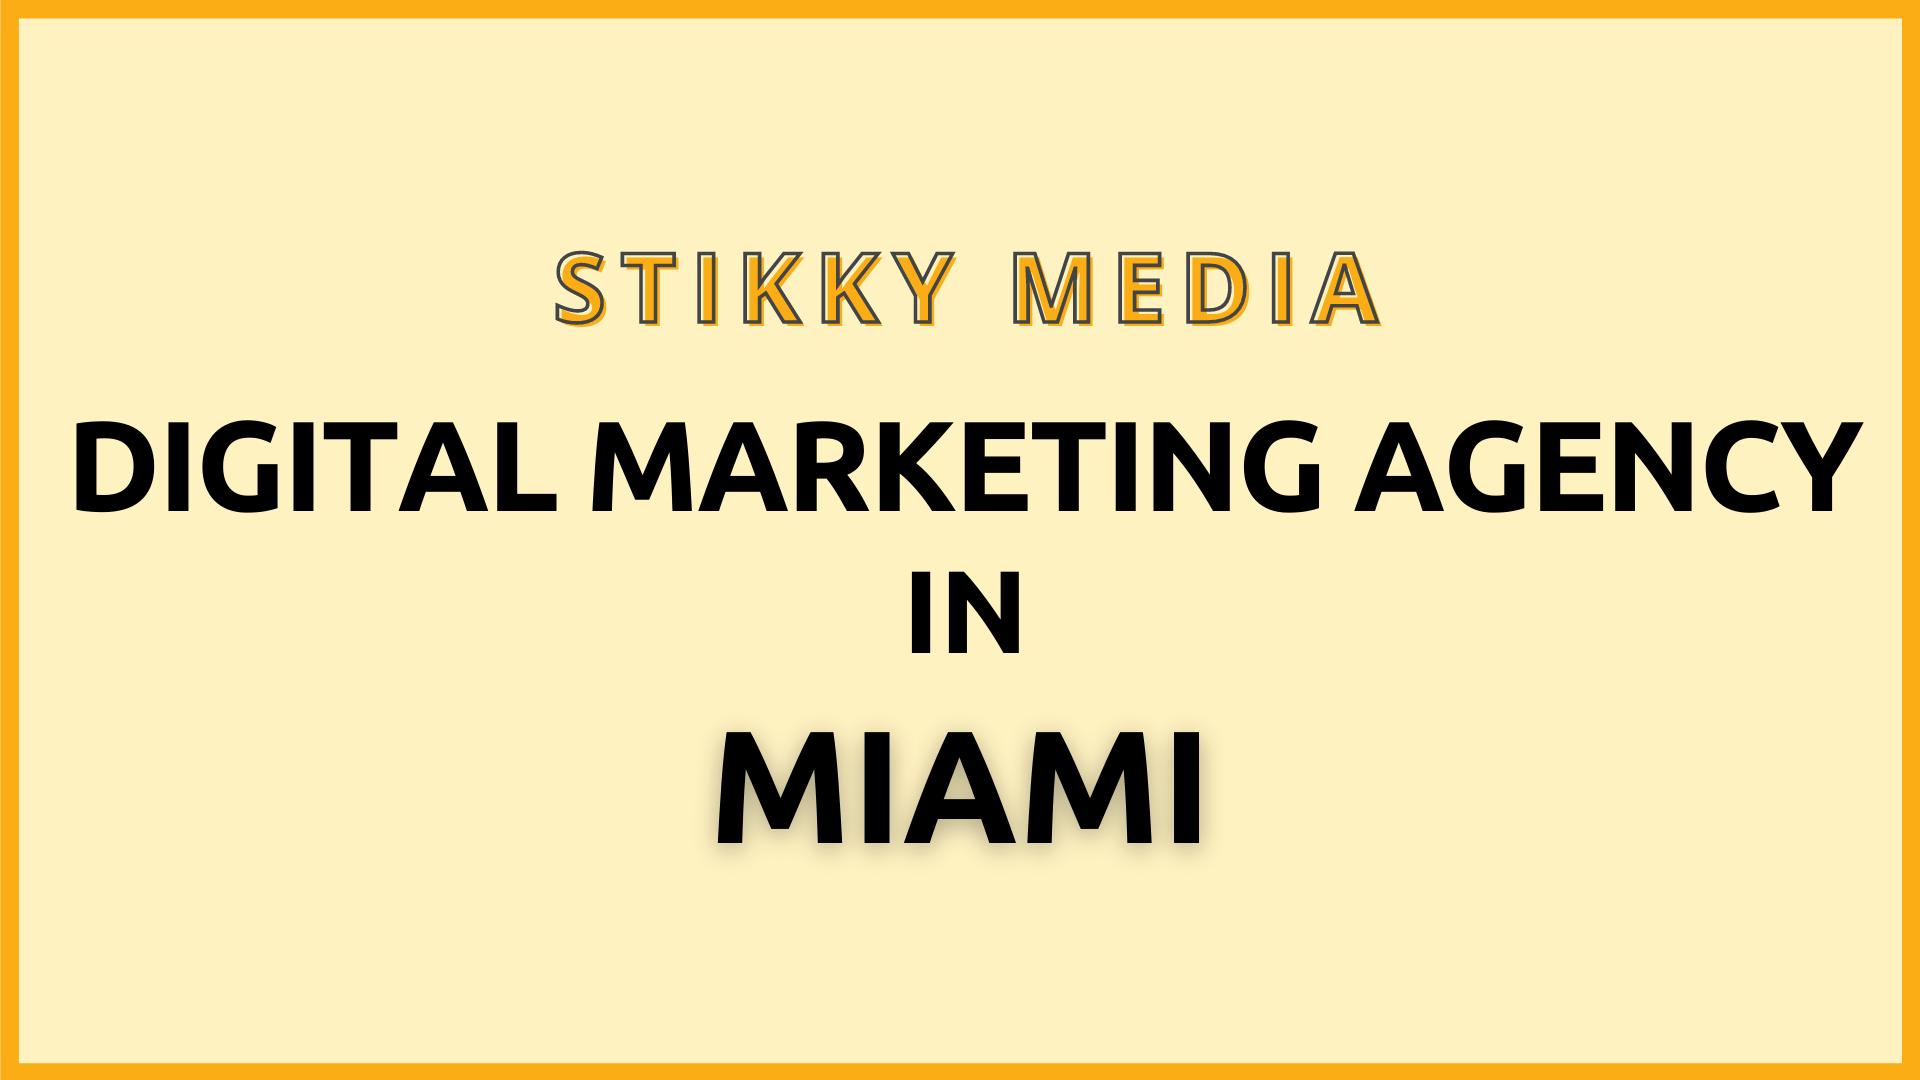 Digital marketing services Miami - Stikky Media